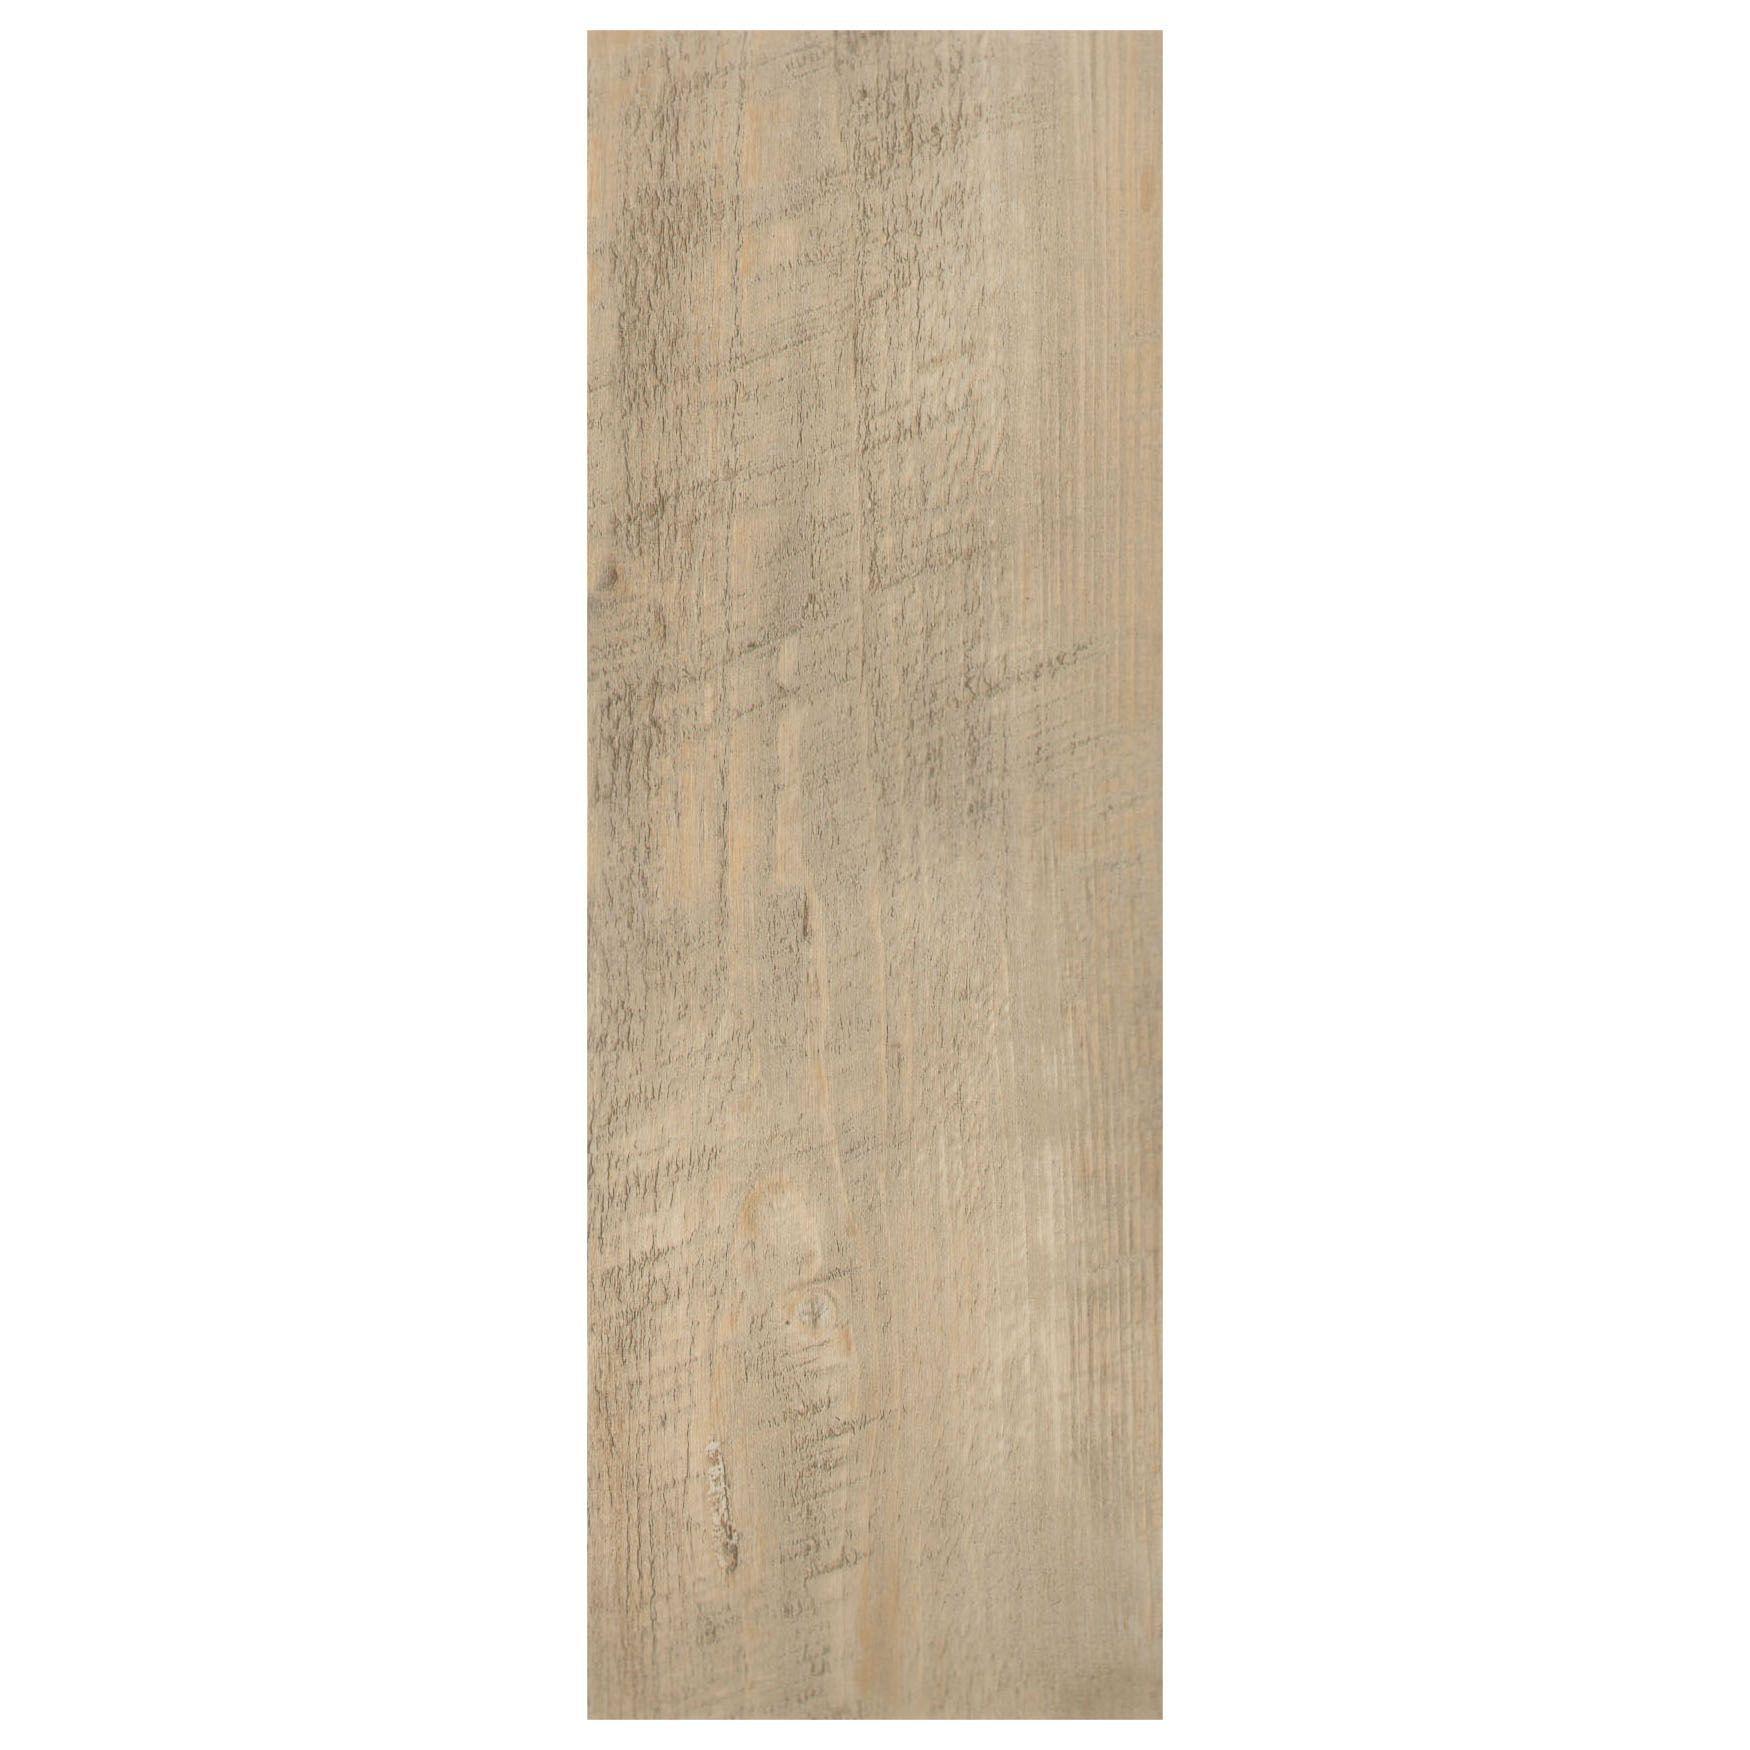 colours syrinx self adhesive grey wood effect vinyl plank 1m pack